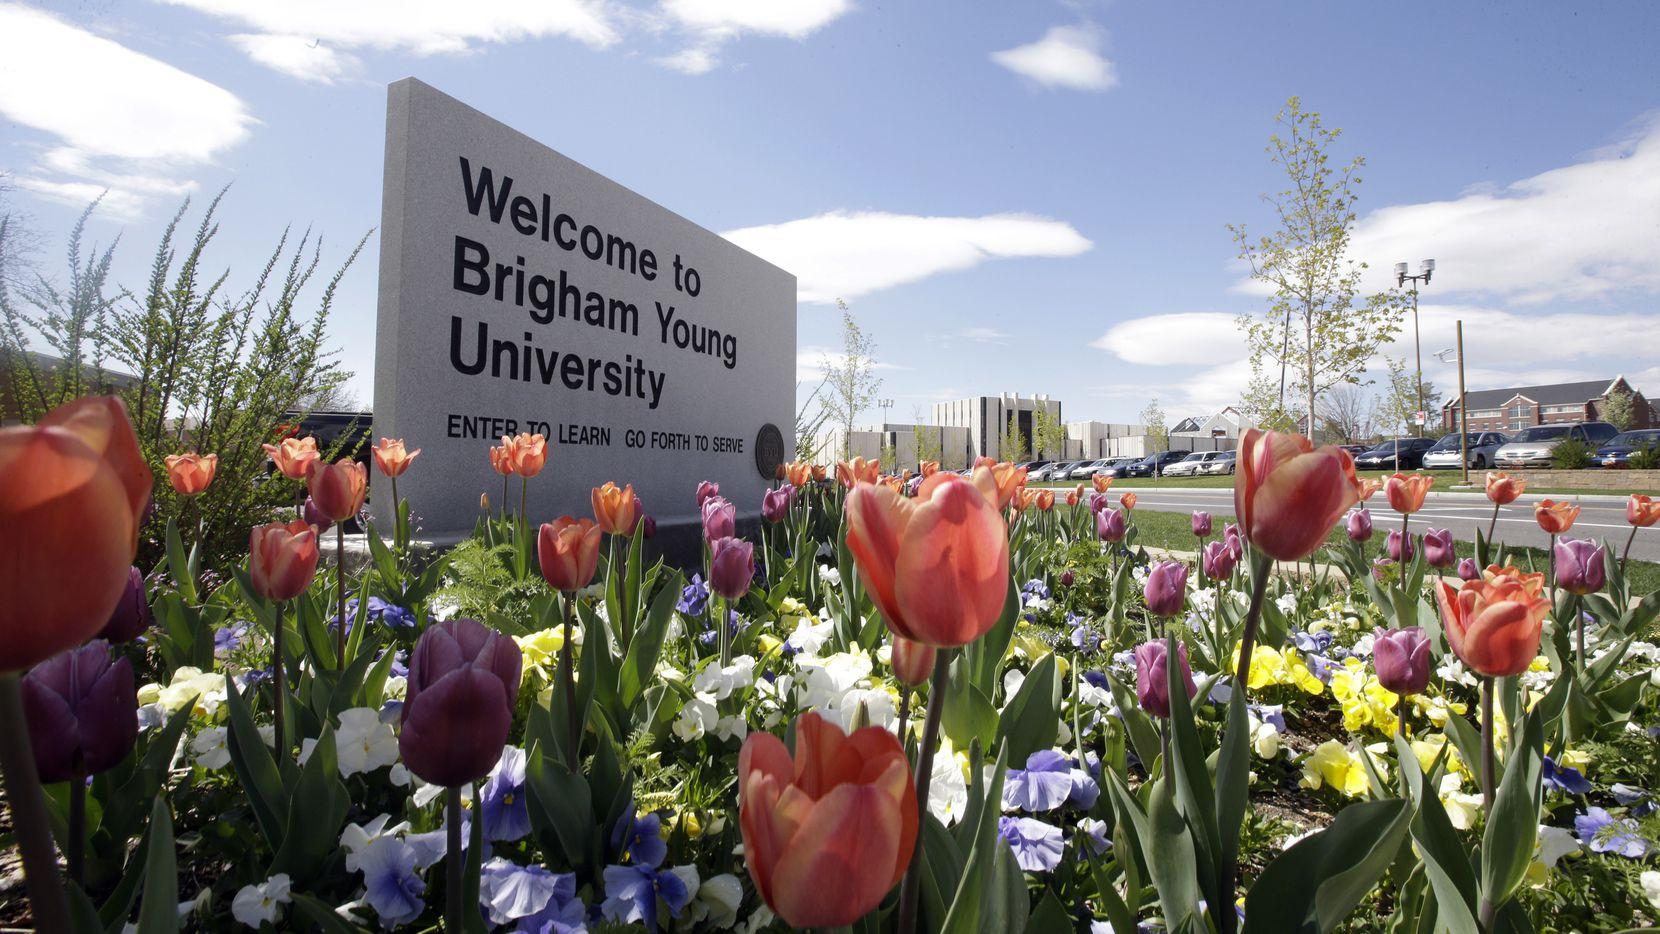 Brigham Young University in Provo, Utah. (AP Photo/Rick Bowmer, File)